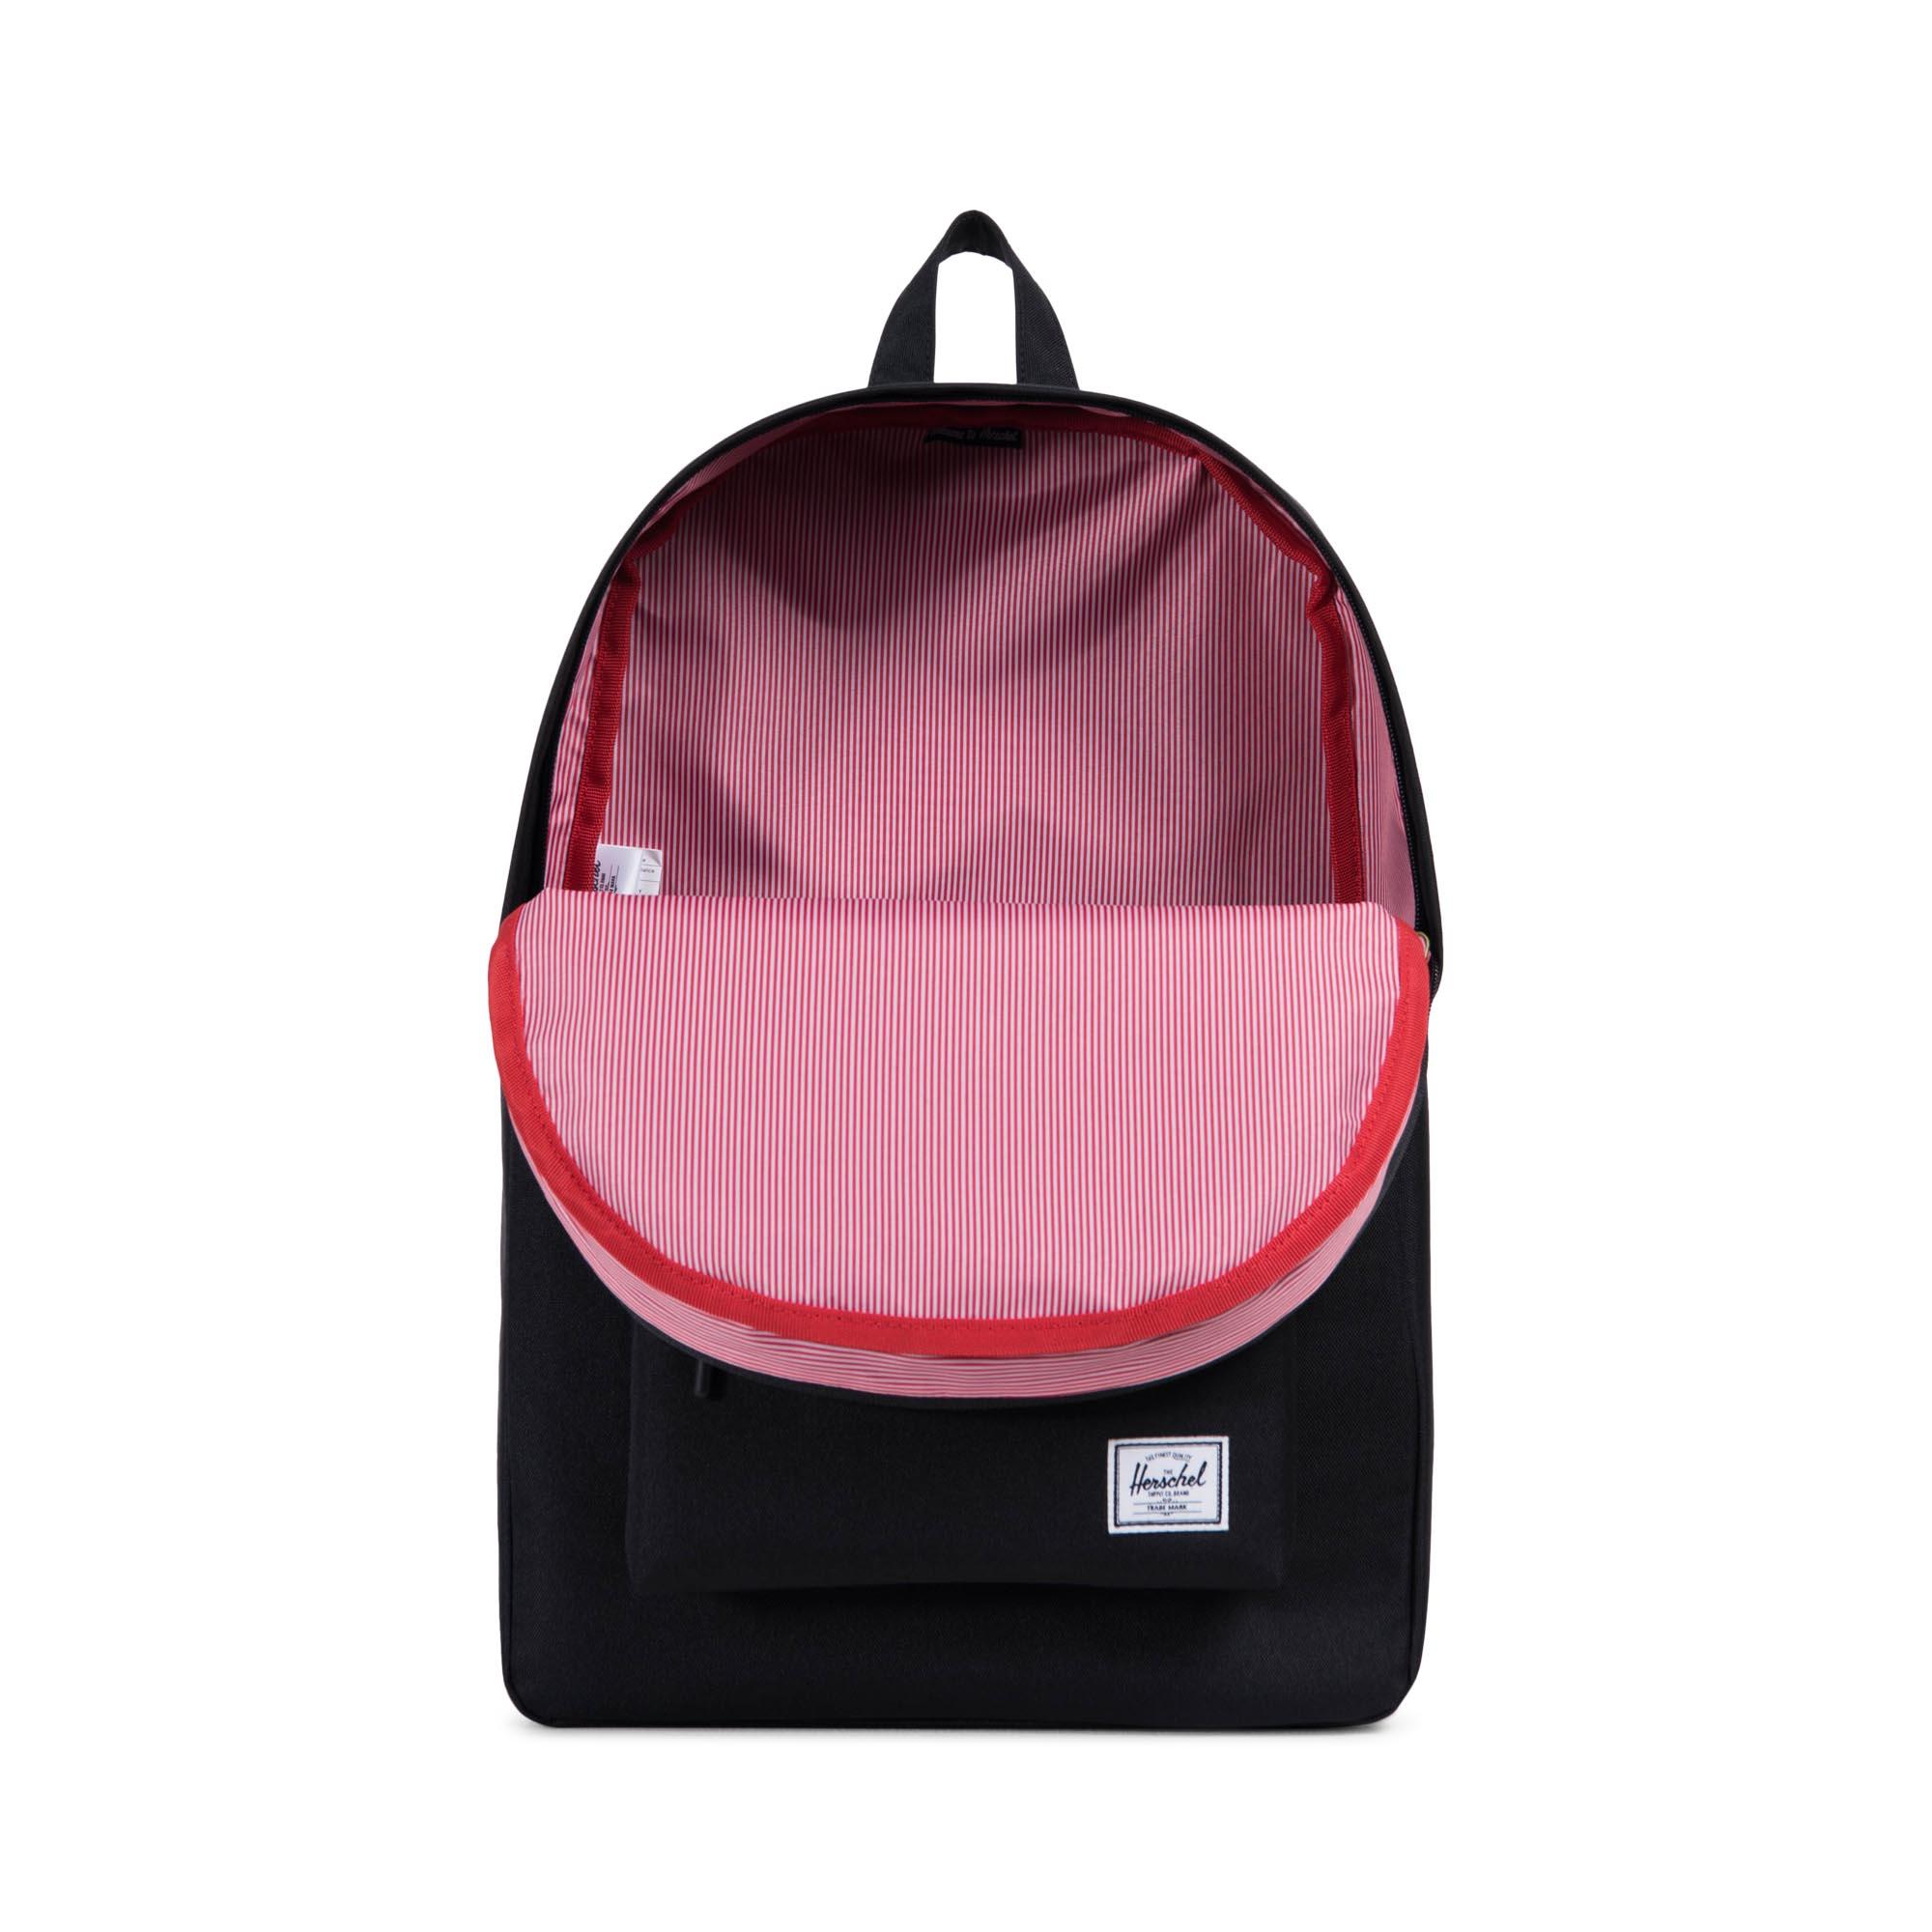 Herschel Rucksack Classic Backpack black 10001-00001 F18-HT1